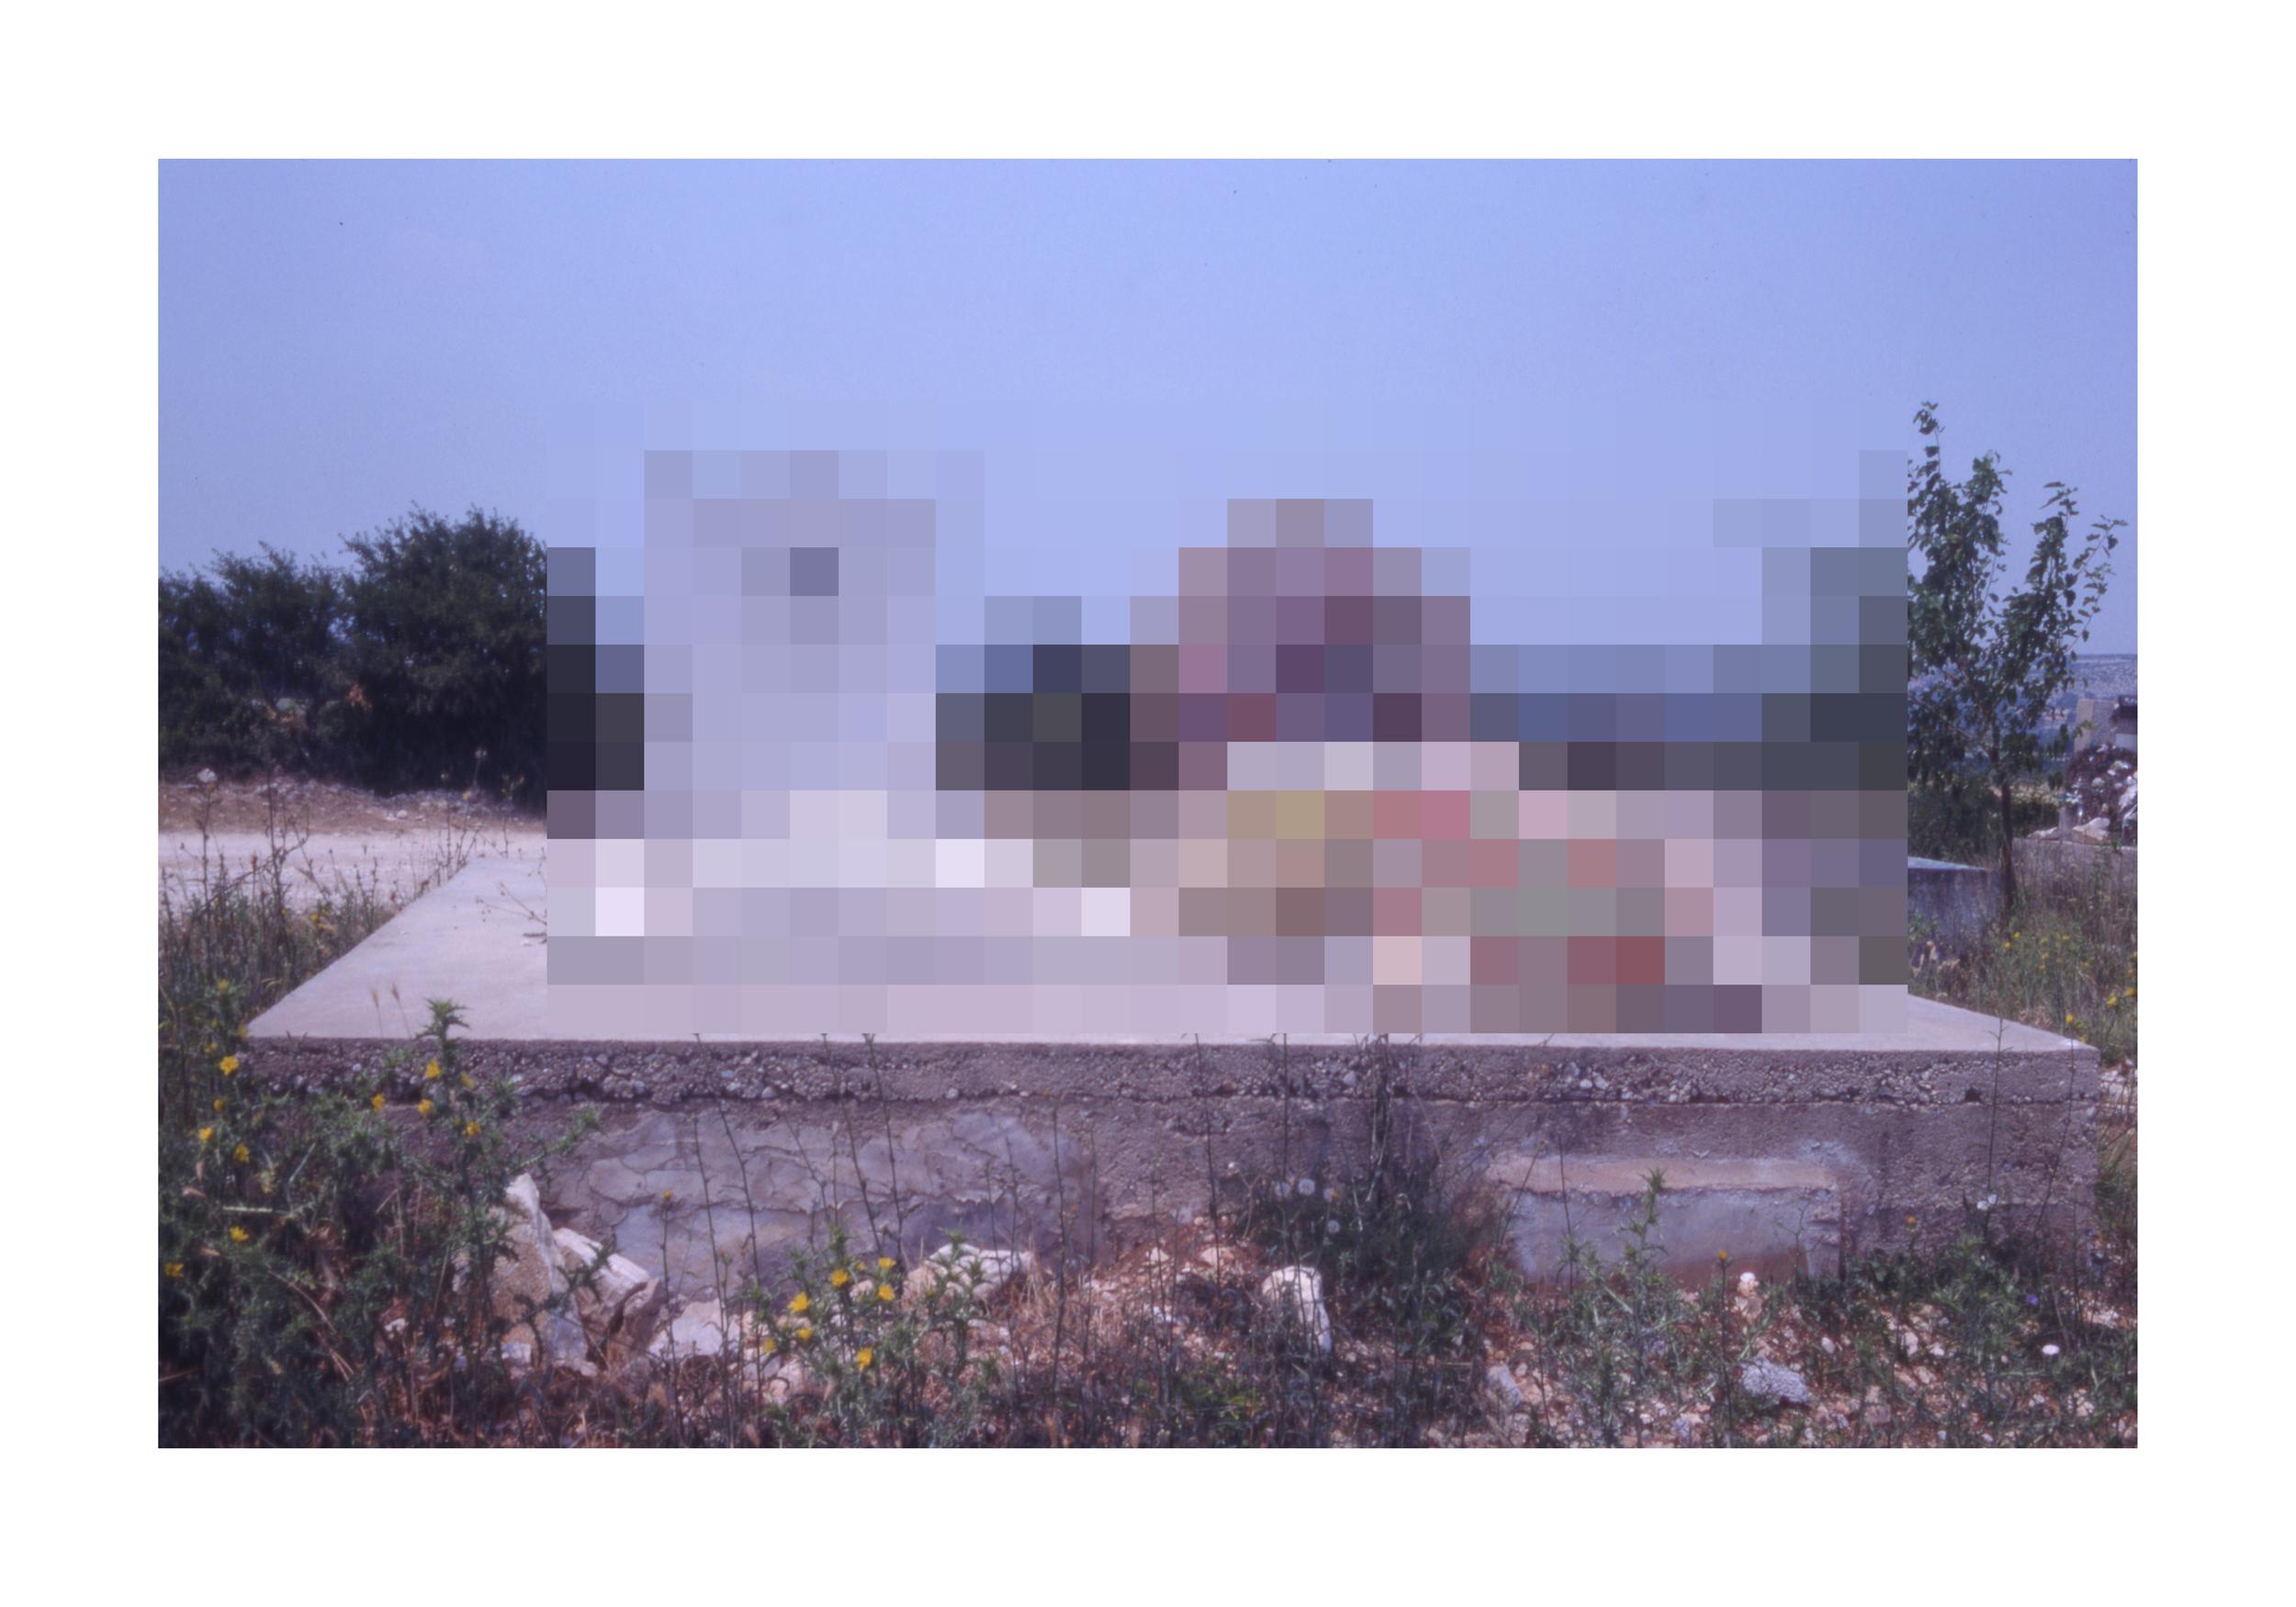 Untitled (p037), 2014